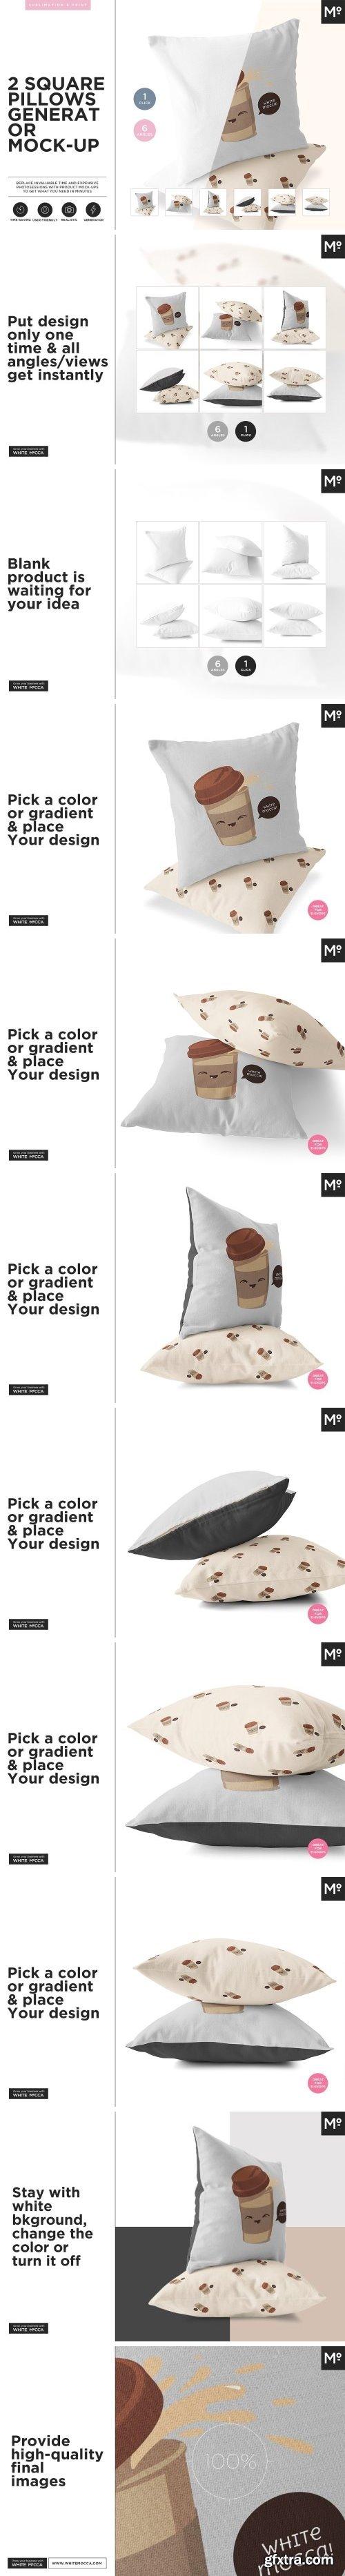 CM - 2 Square Pillows Generator Mock-up 1510334